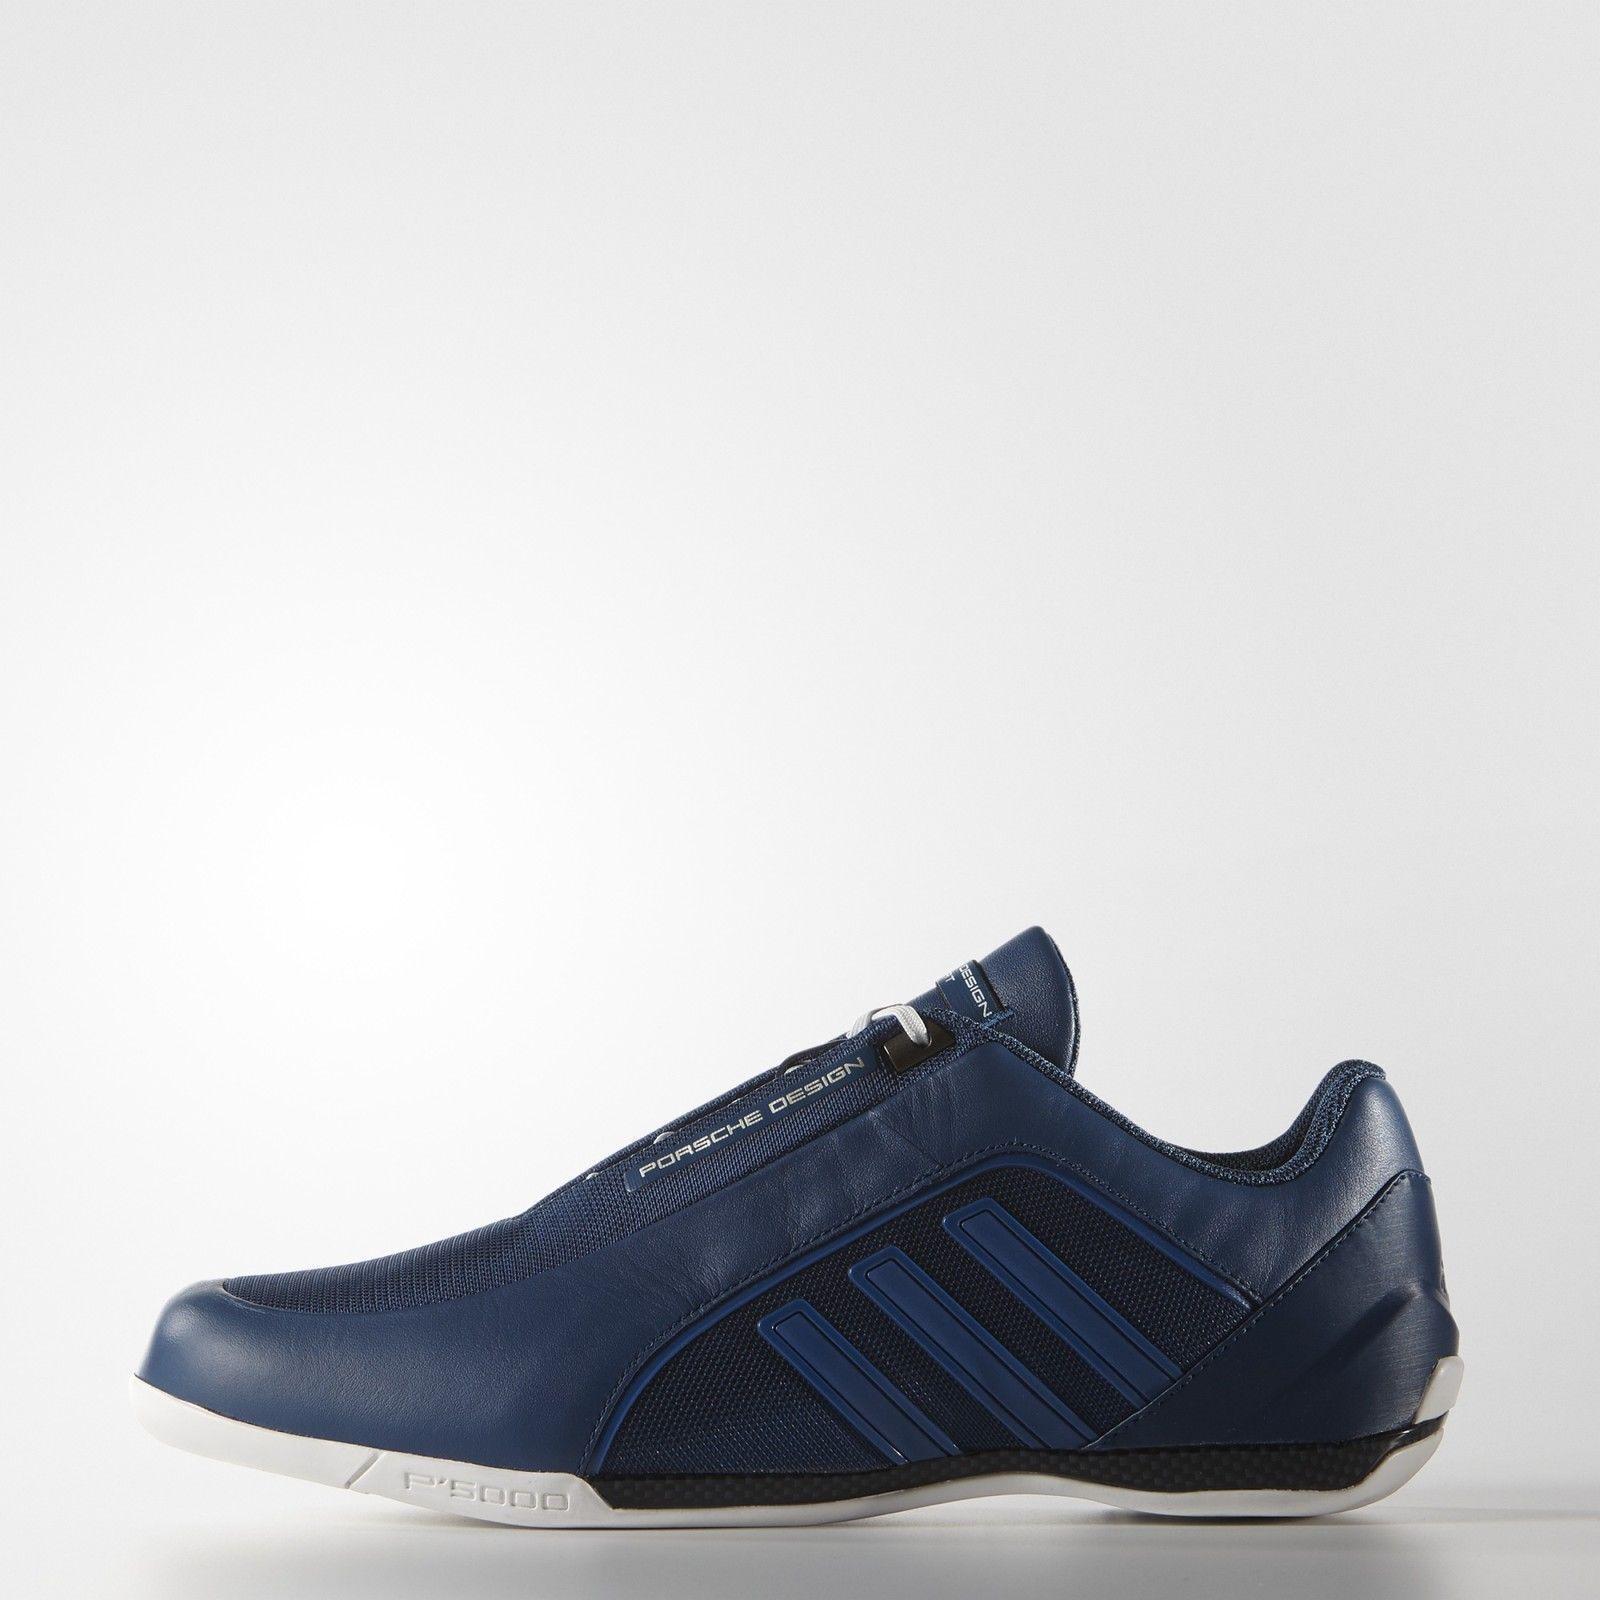 Adidas porsche design Athletic II 2 Mesh perfomance af4400 Azul marino